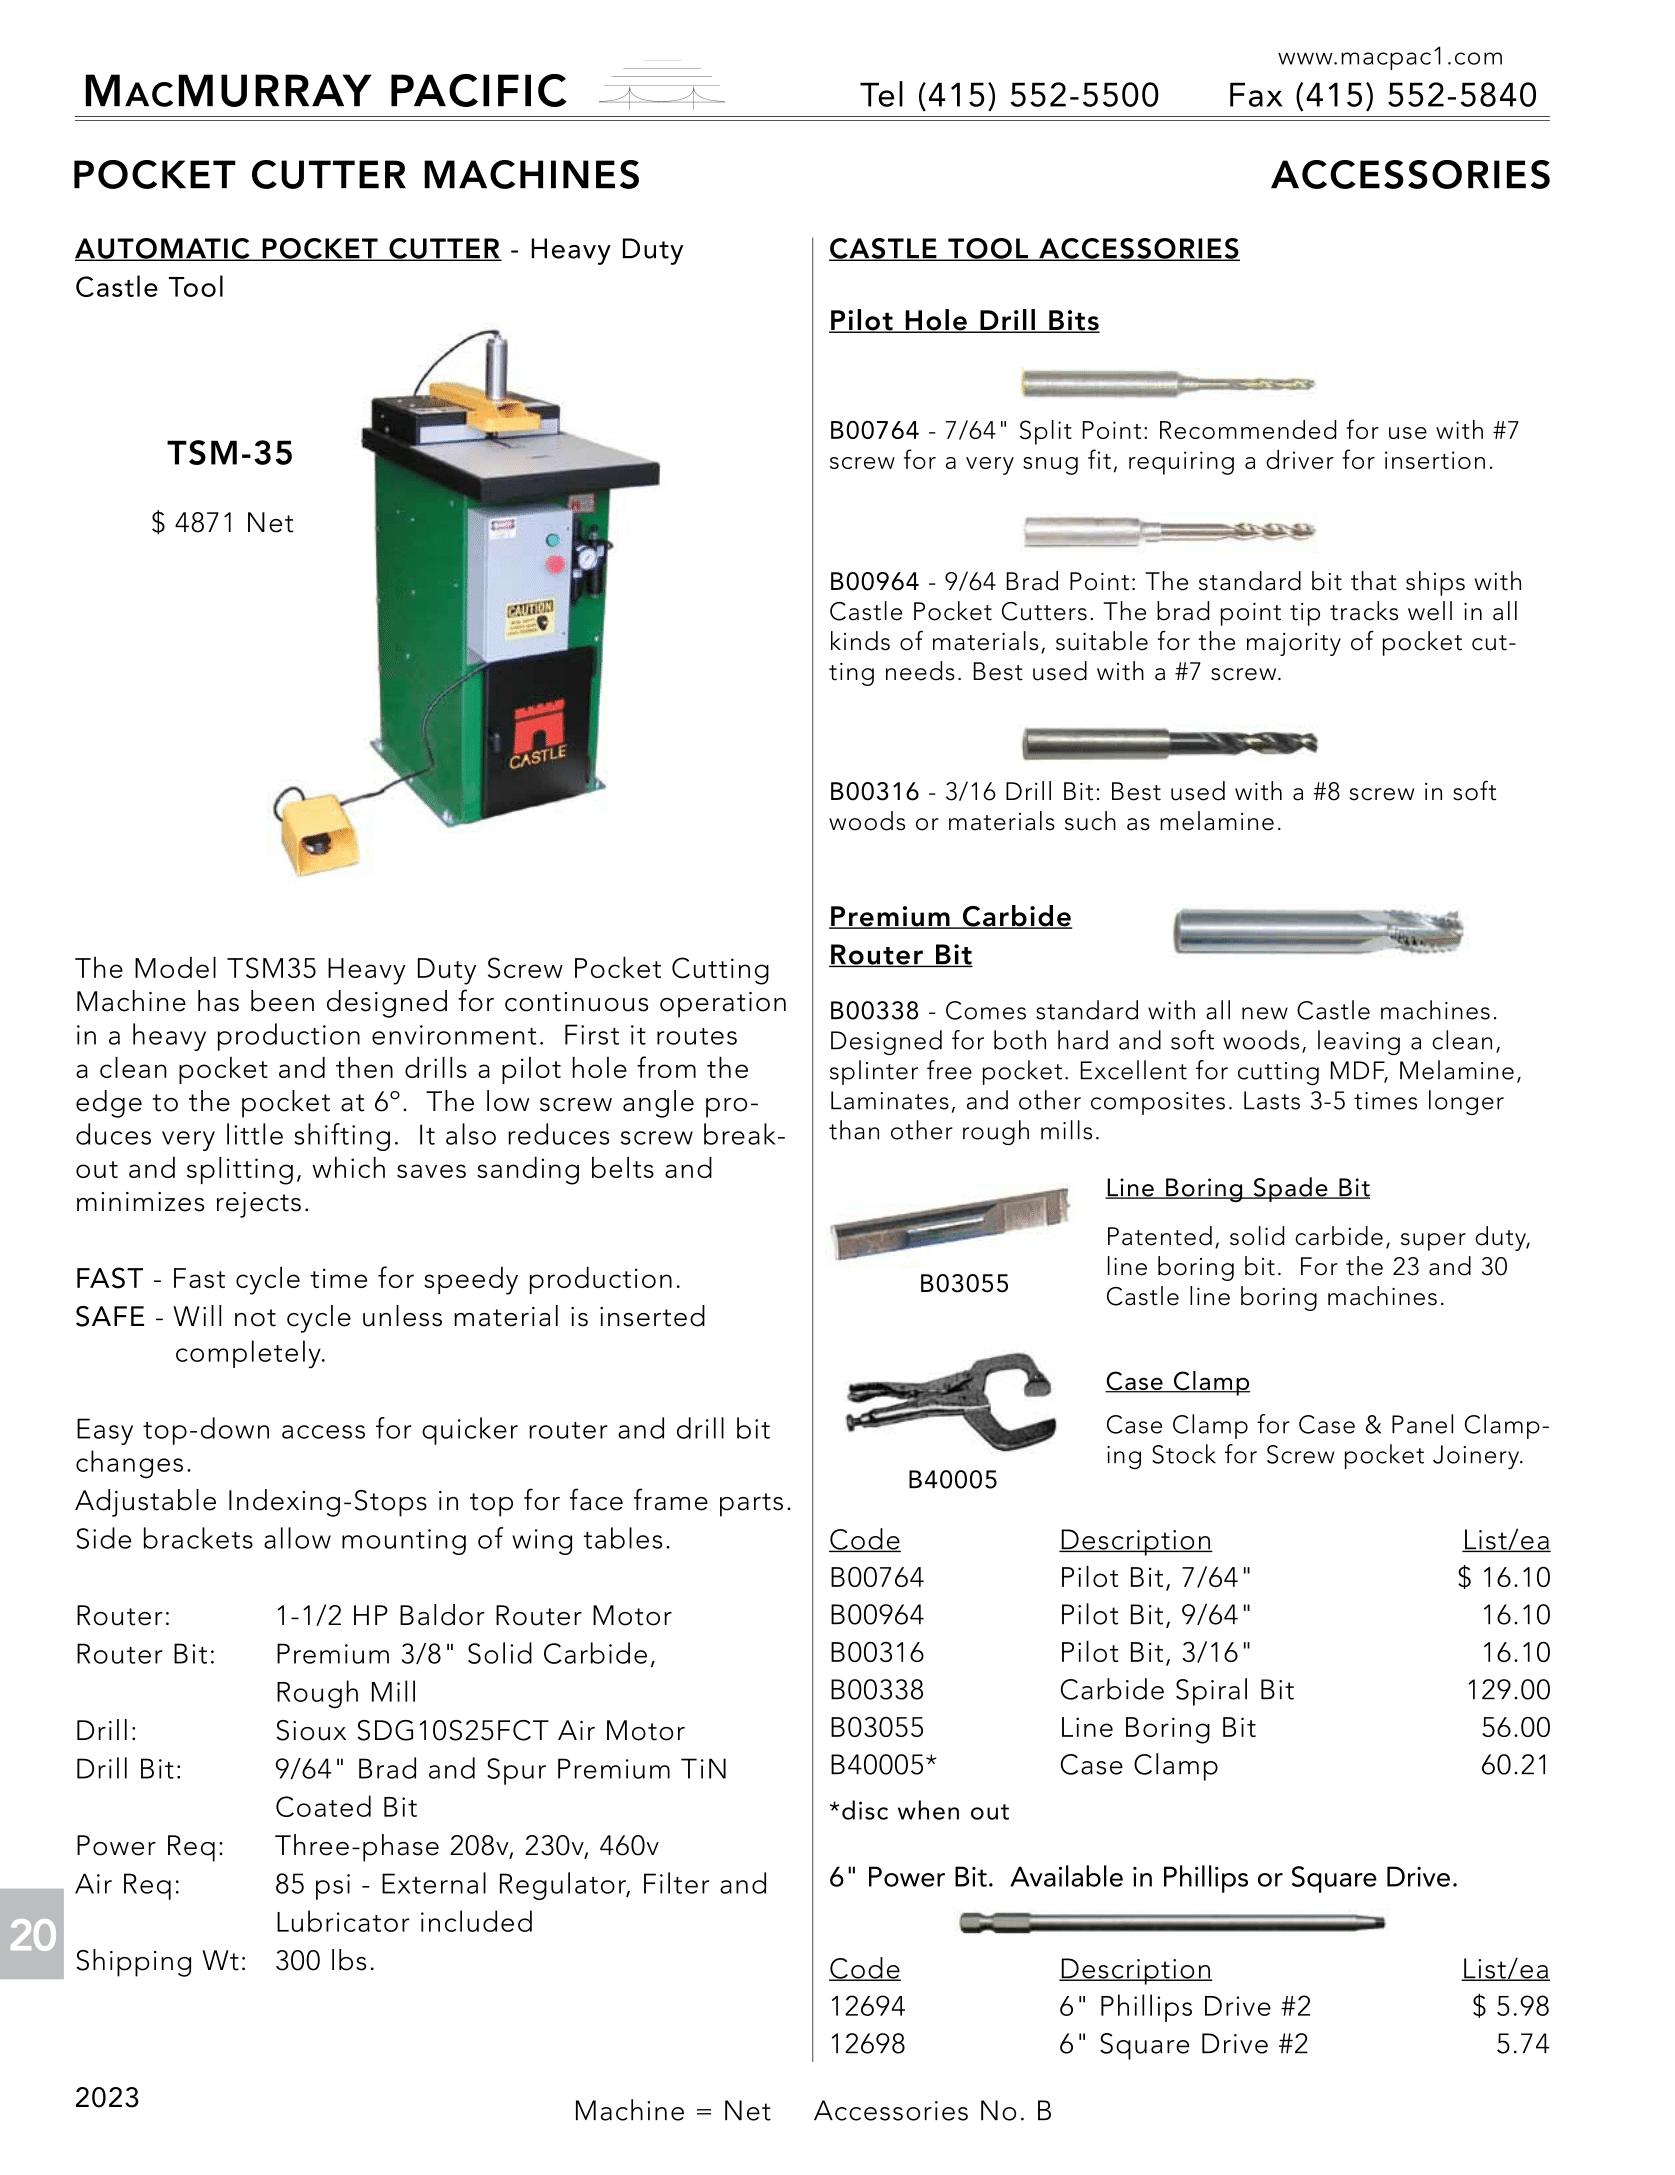 MacMurray Pacific Wholesale Hardware